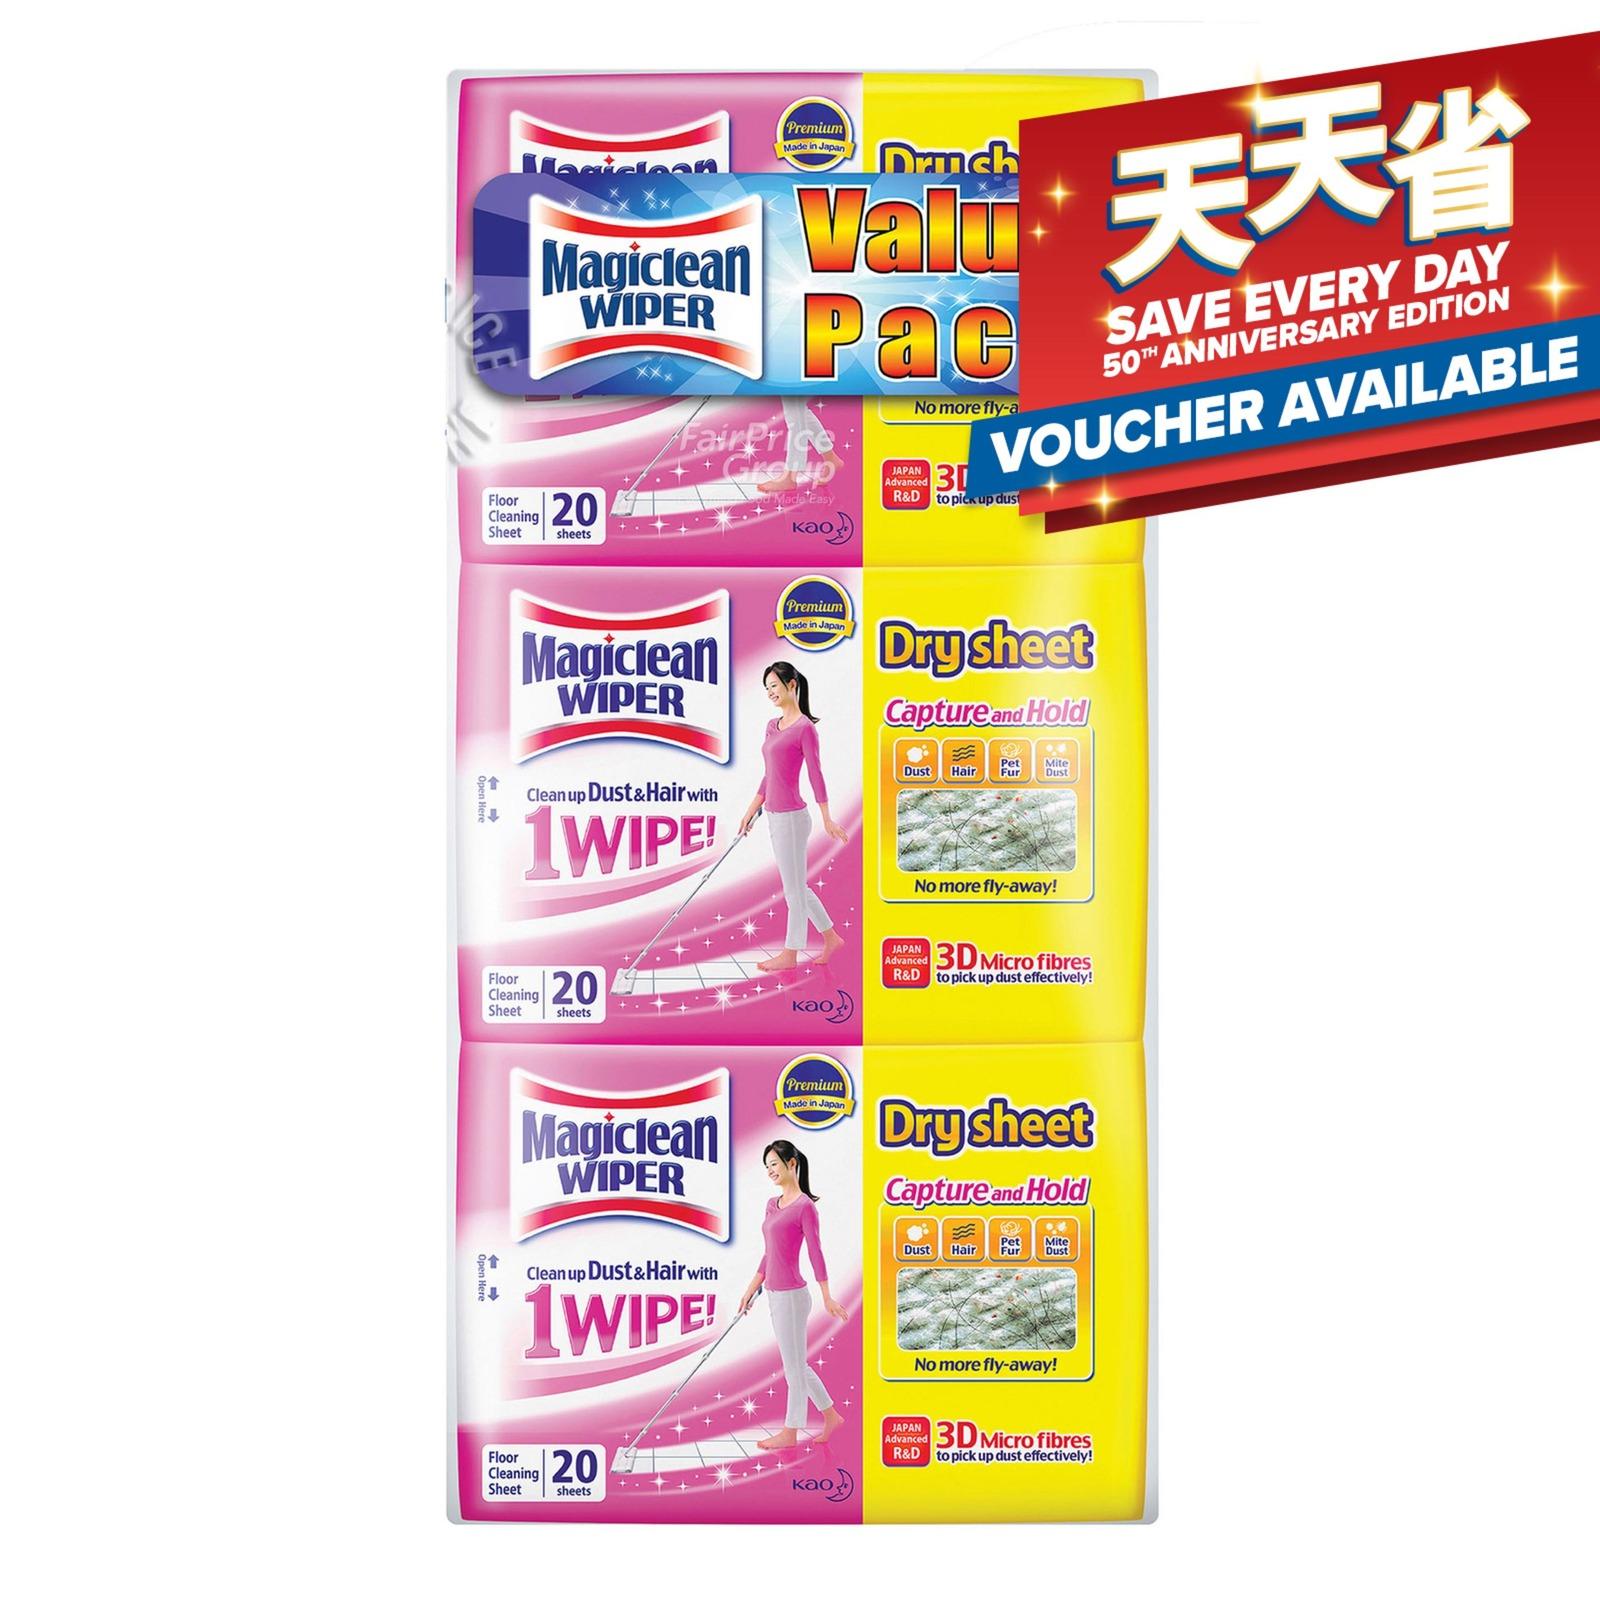 Magiclean Wiper Dry Sheet